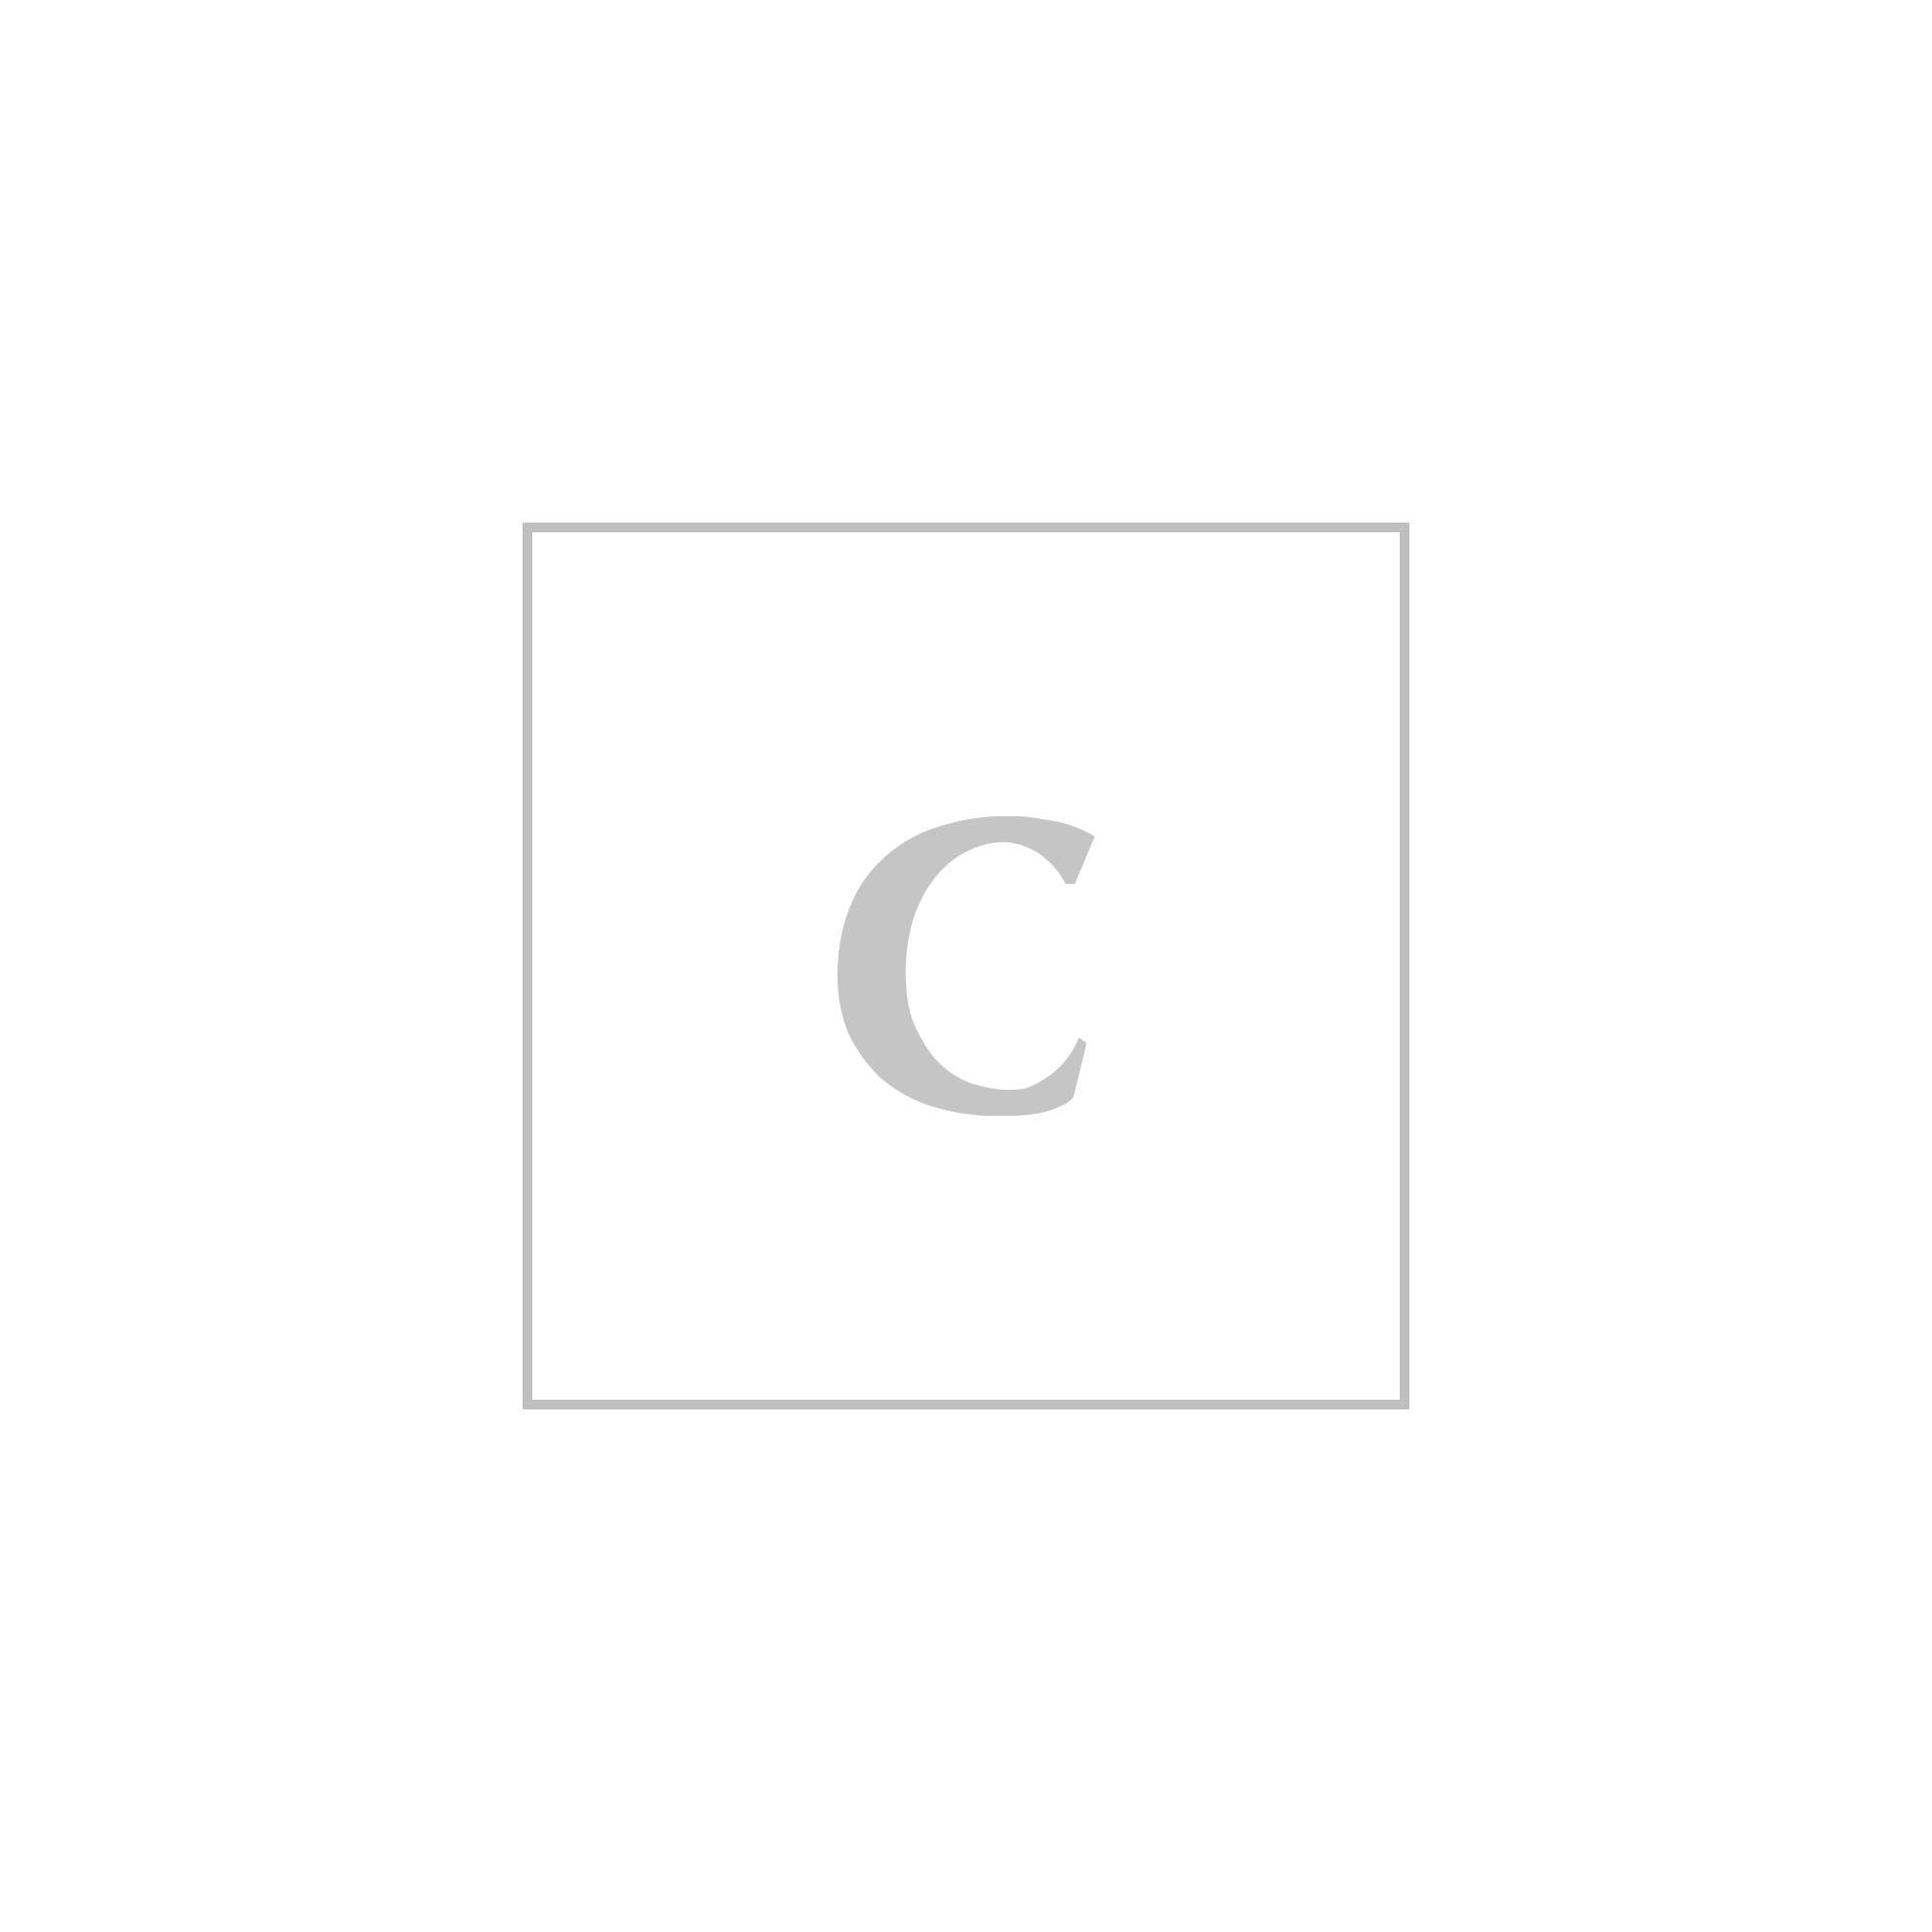 Dolce & gabbana nylon document holder